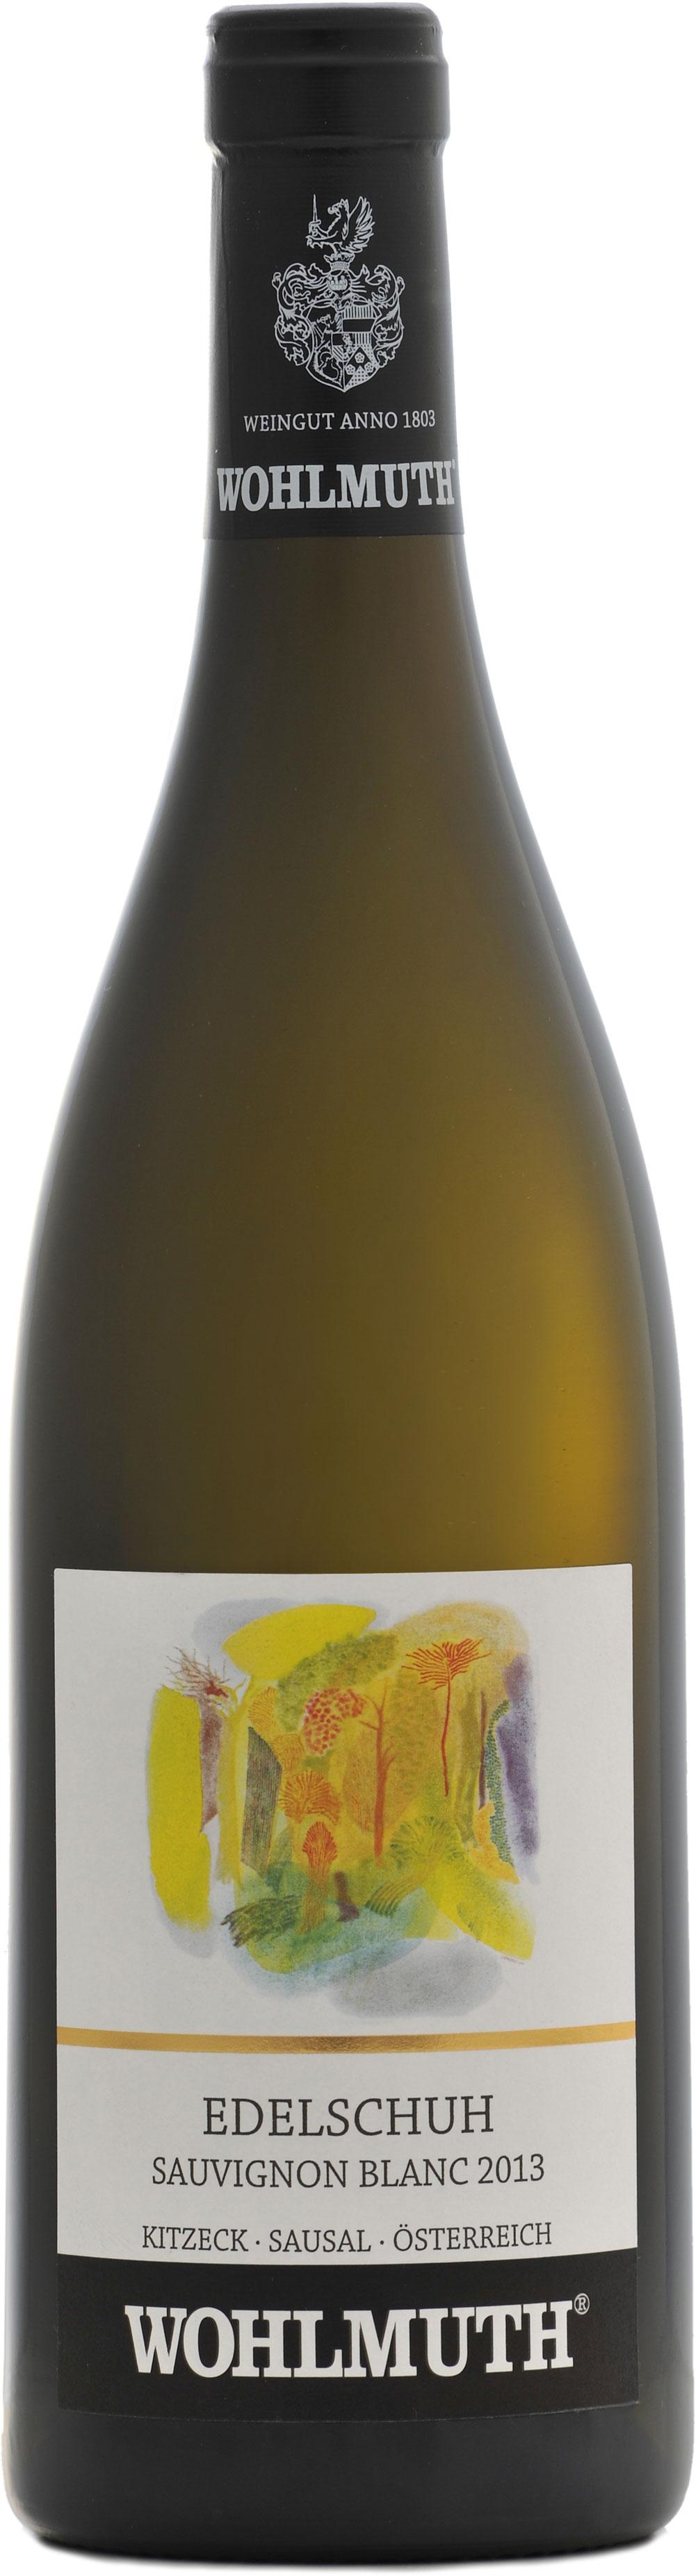 2014 Wohlmuth Sauvignon Blanc Edelschuh Steiermark